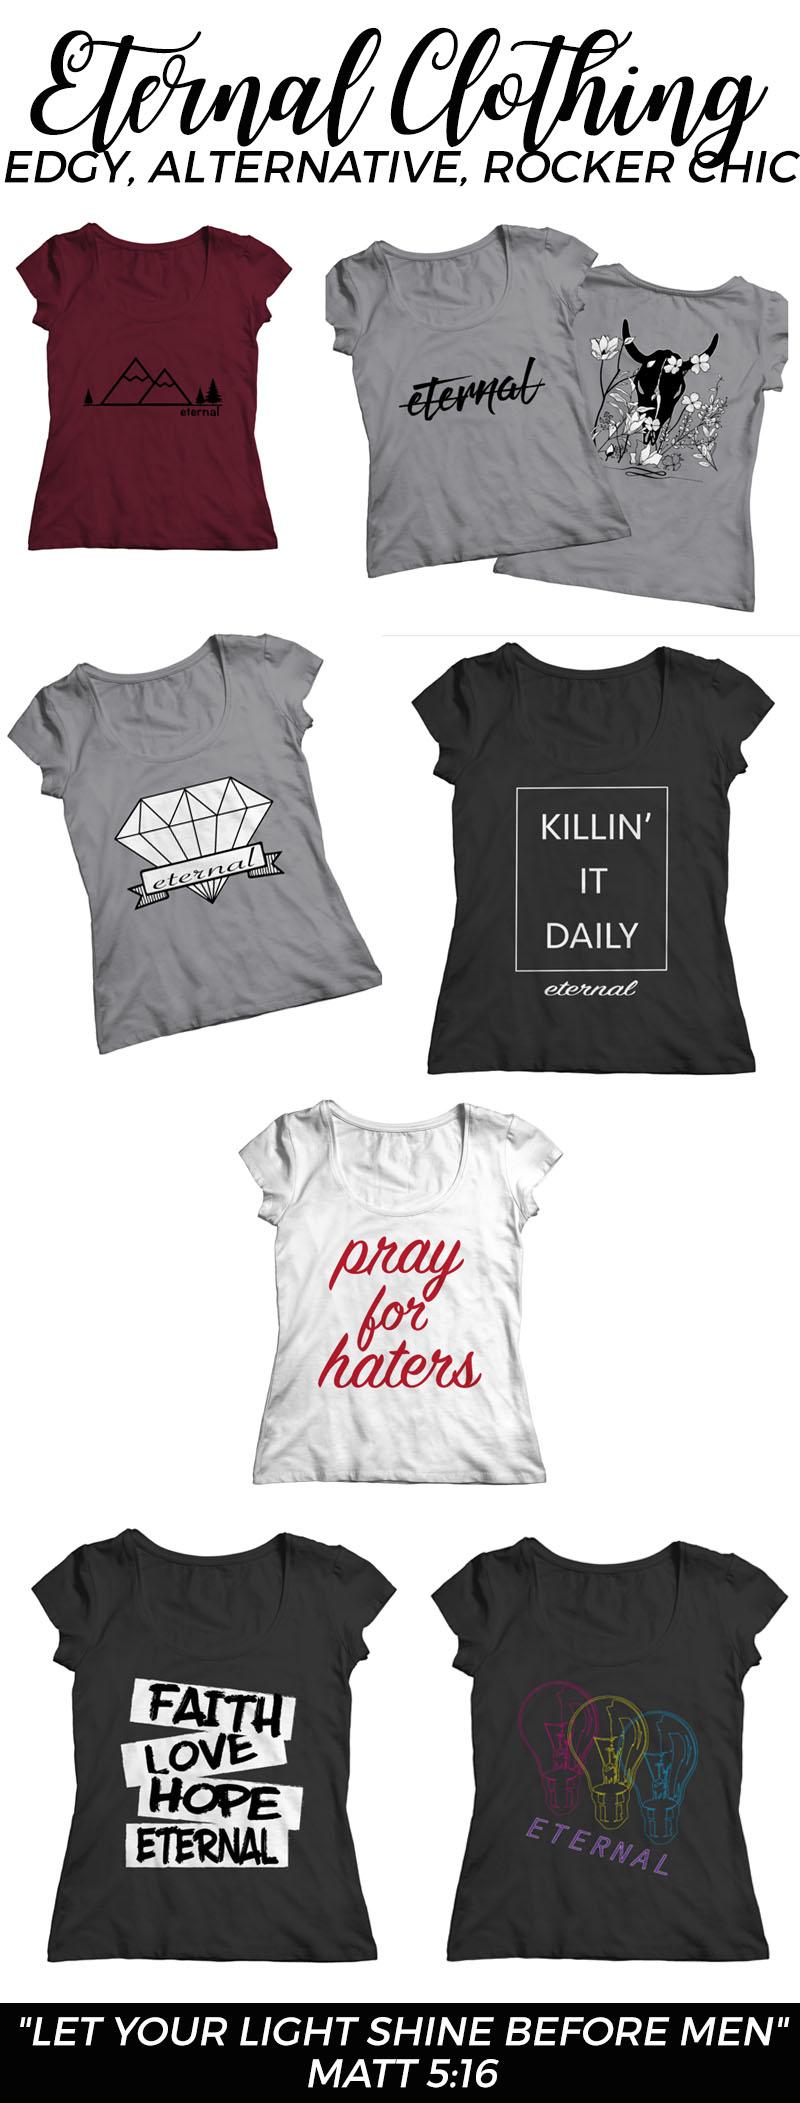 Bible scripture inspired rocker chic/alternative clothing for women     www.eternalclothingco.com